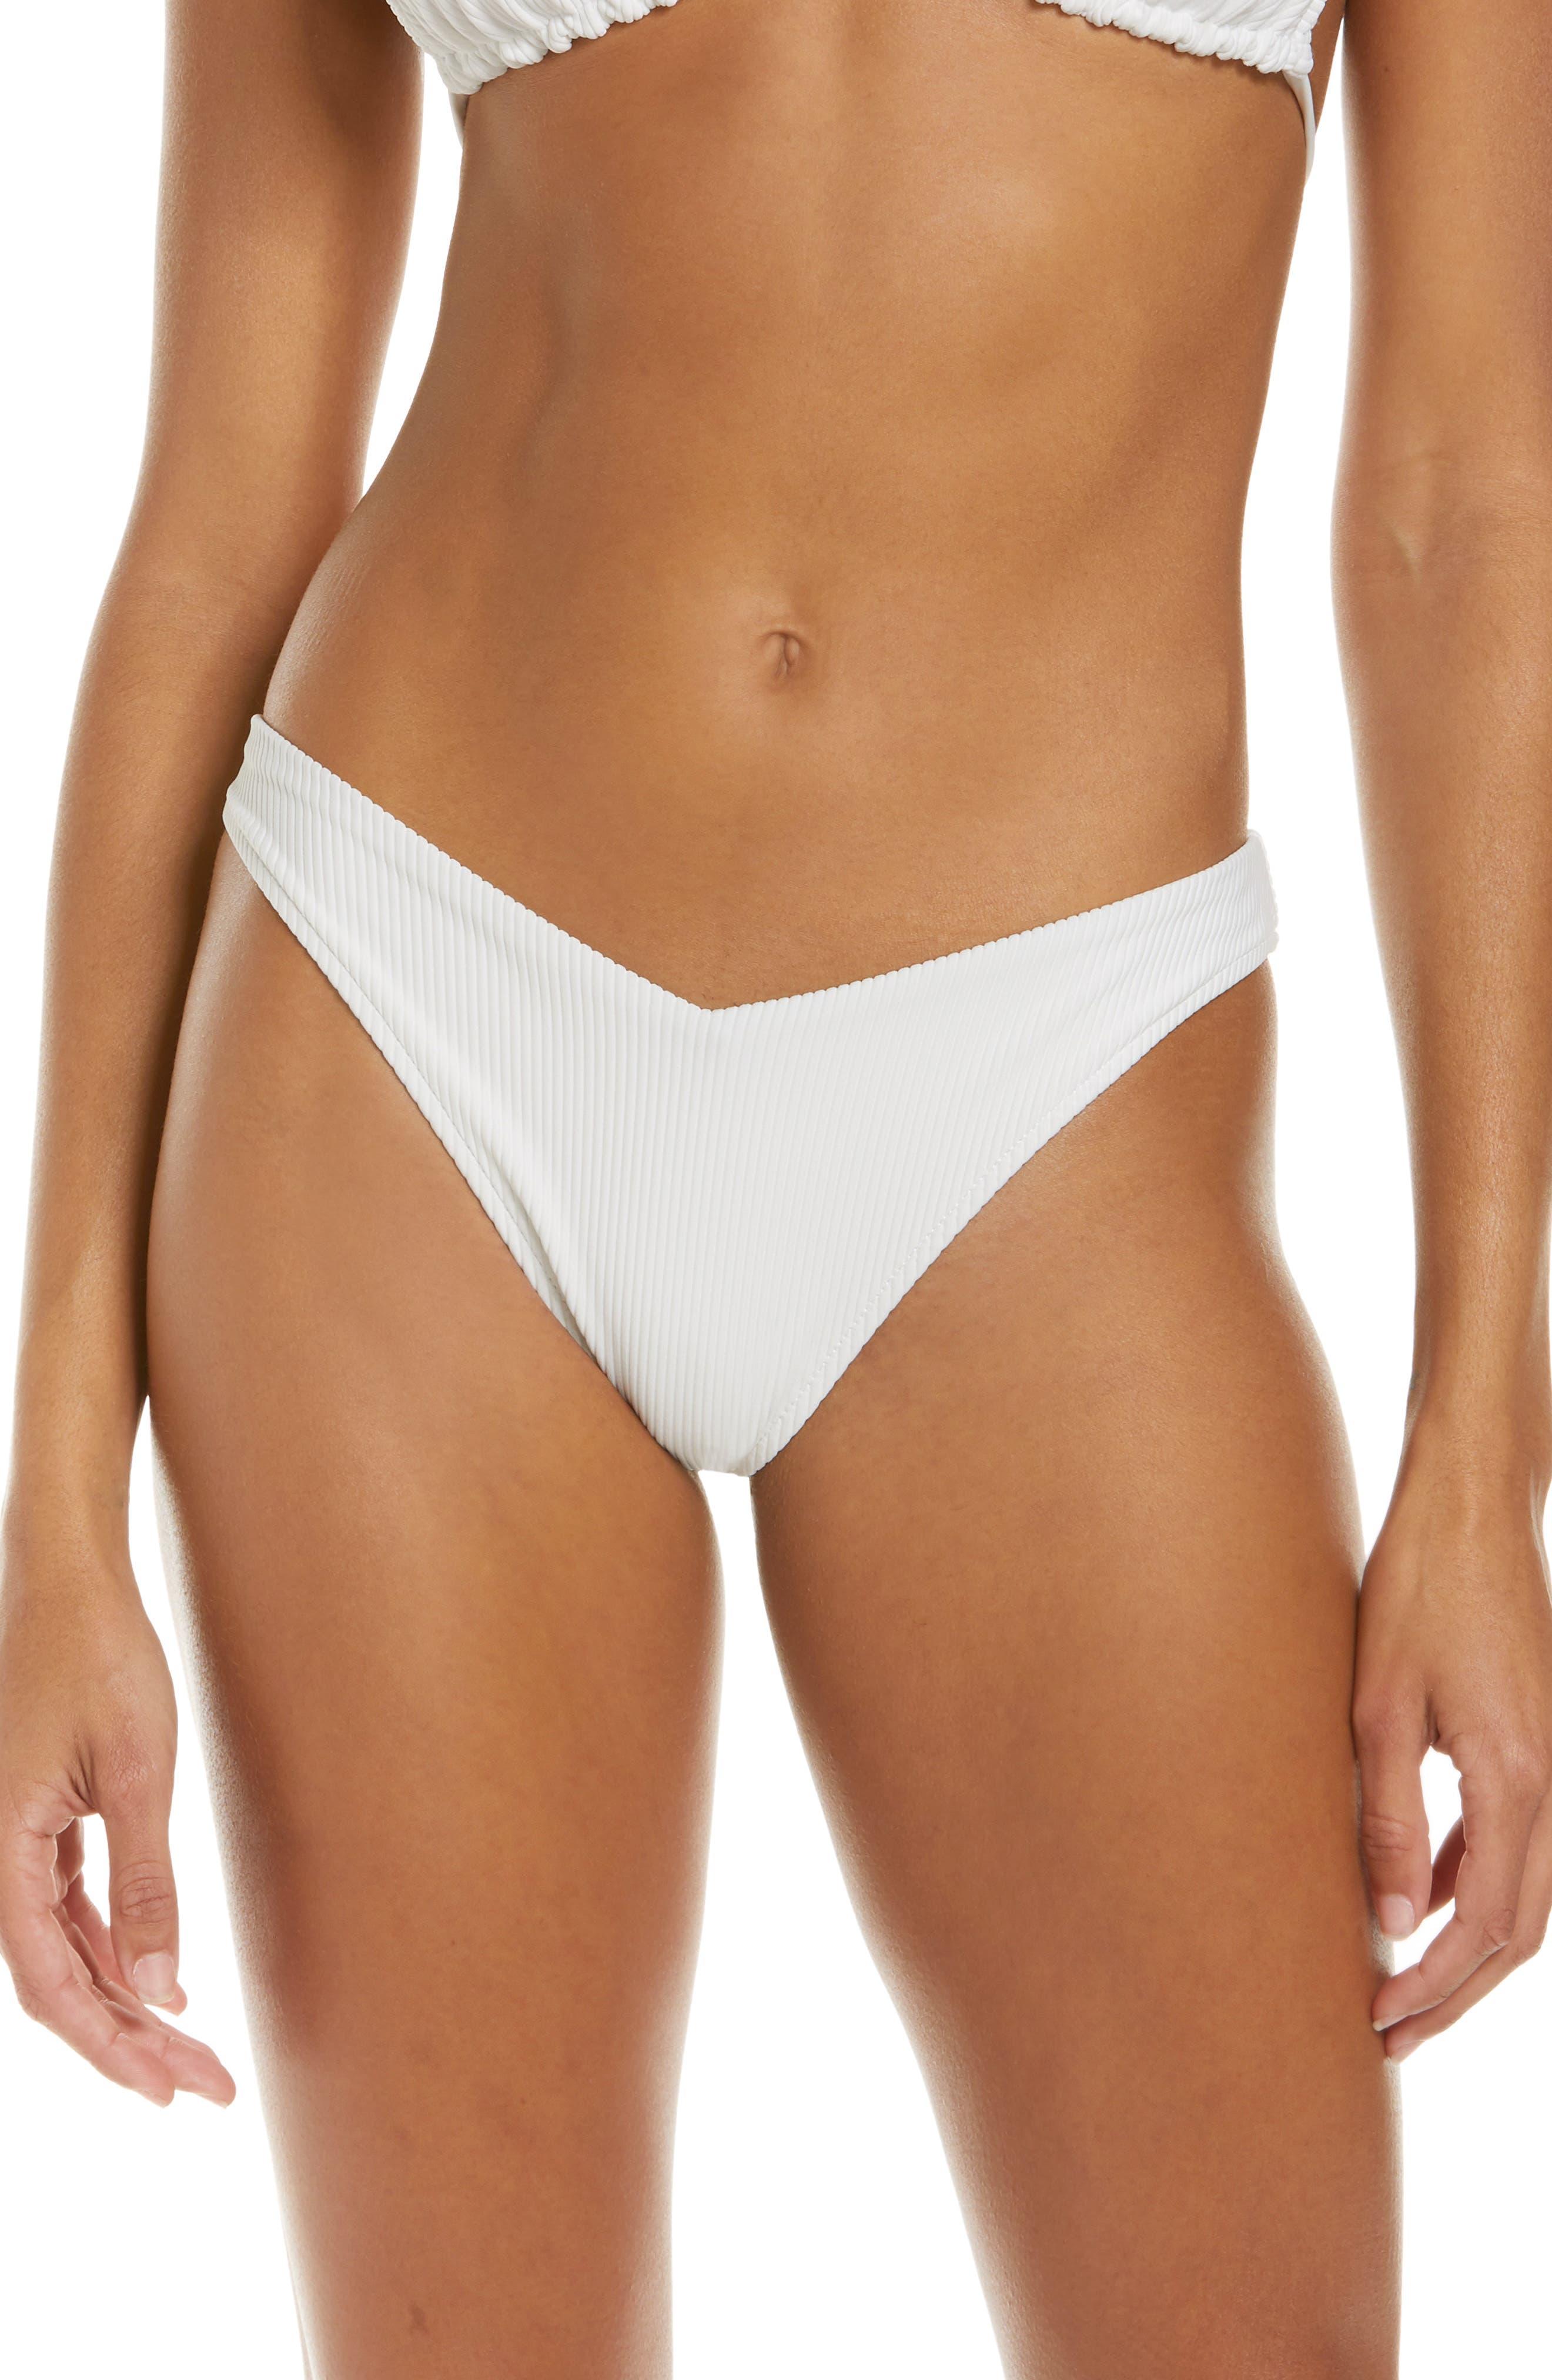 Enzo Bikini Bottoms